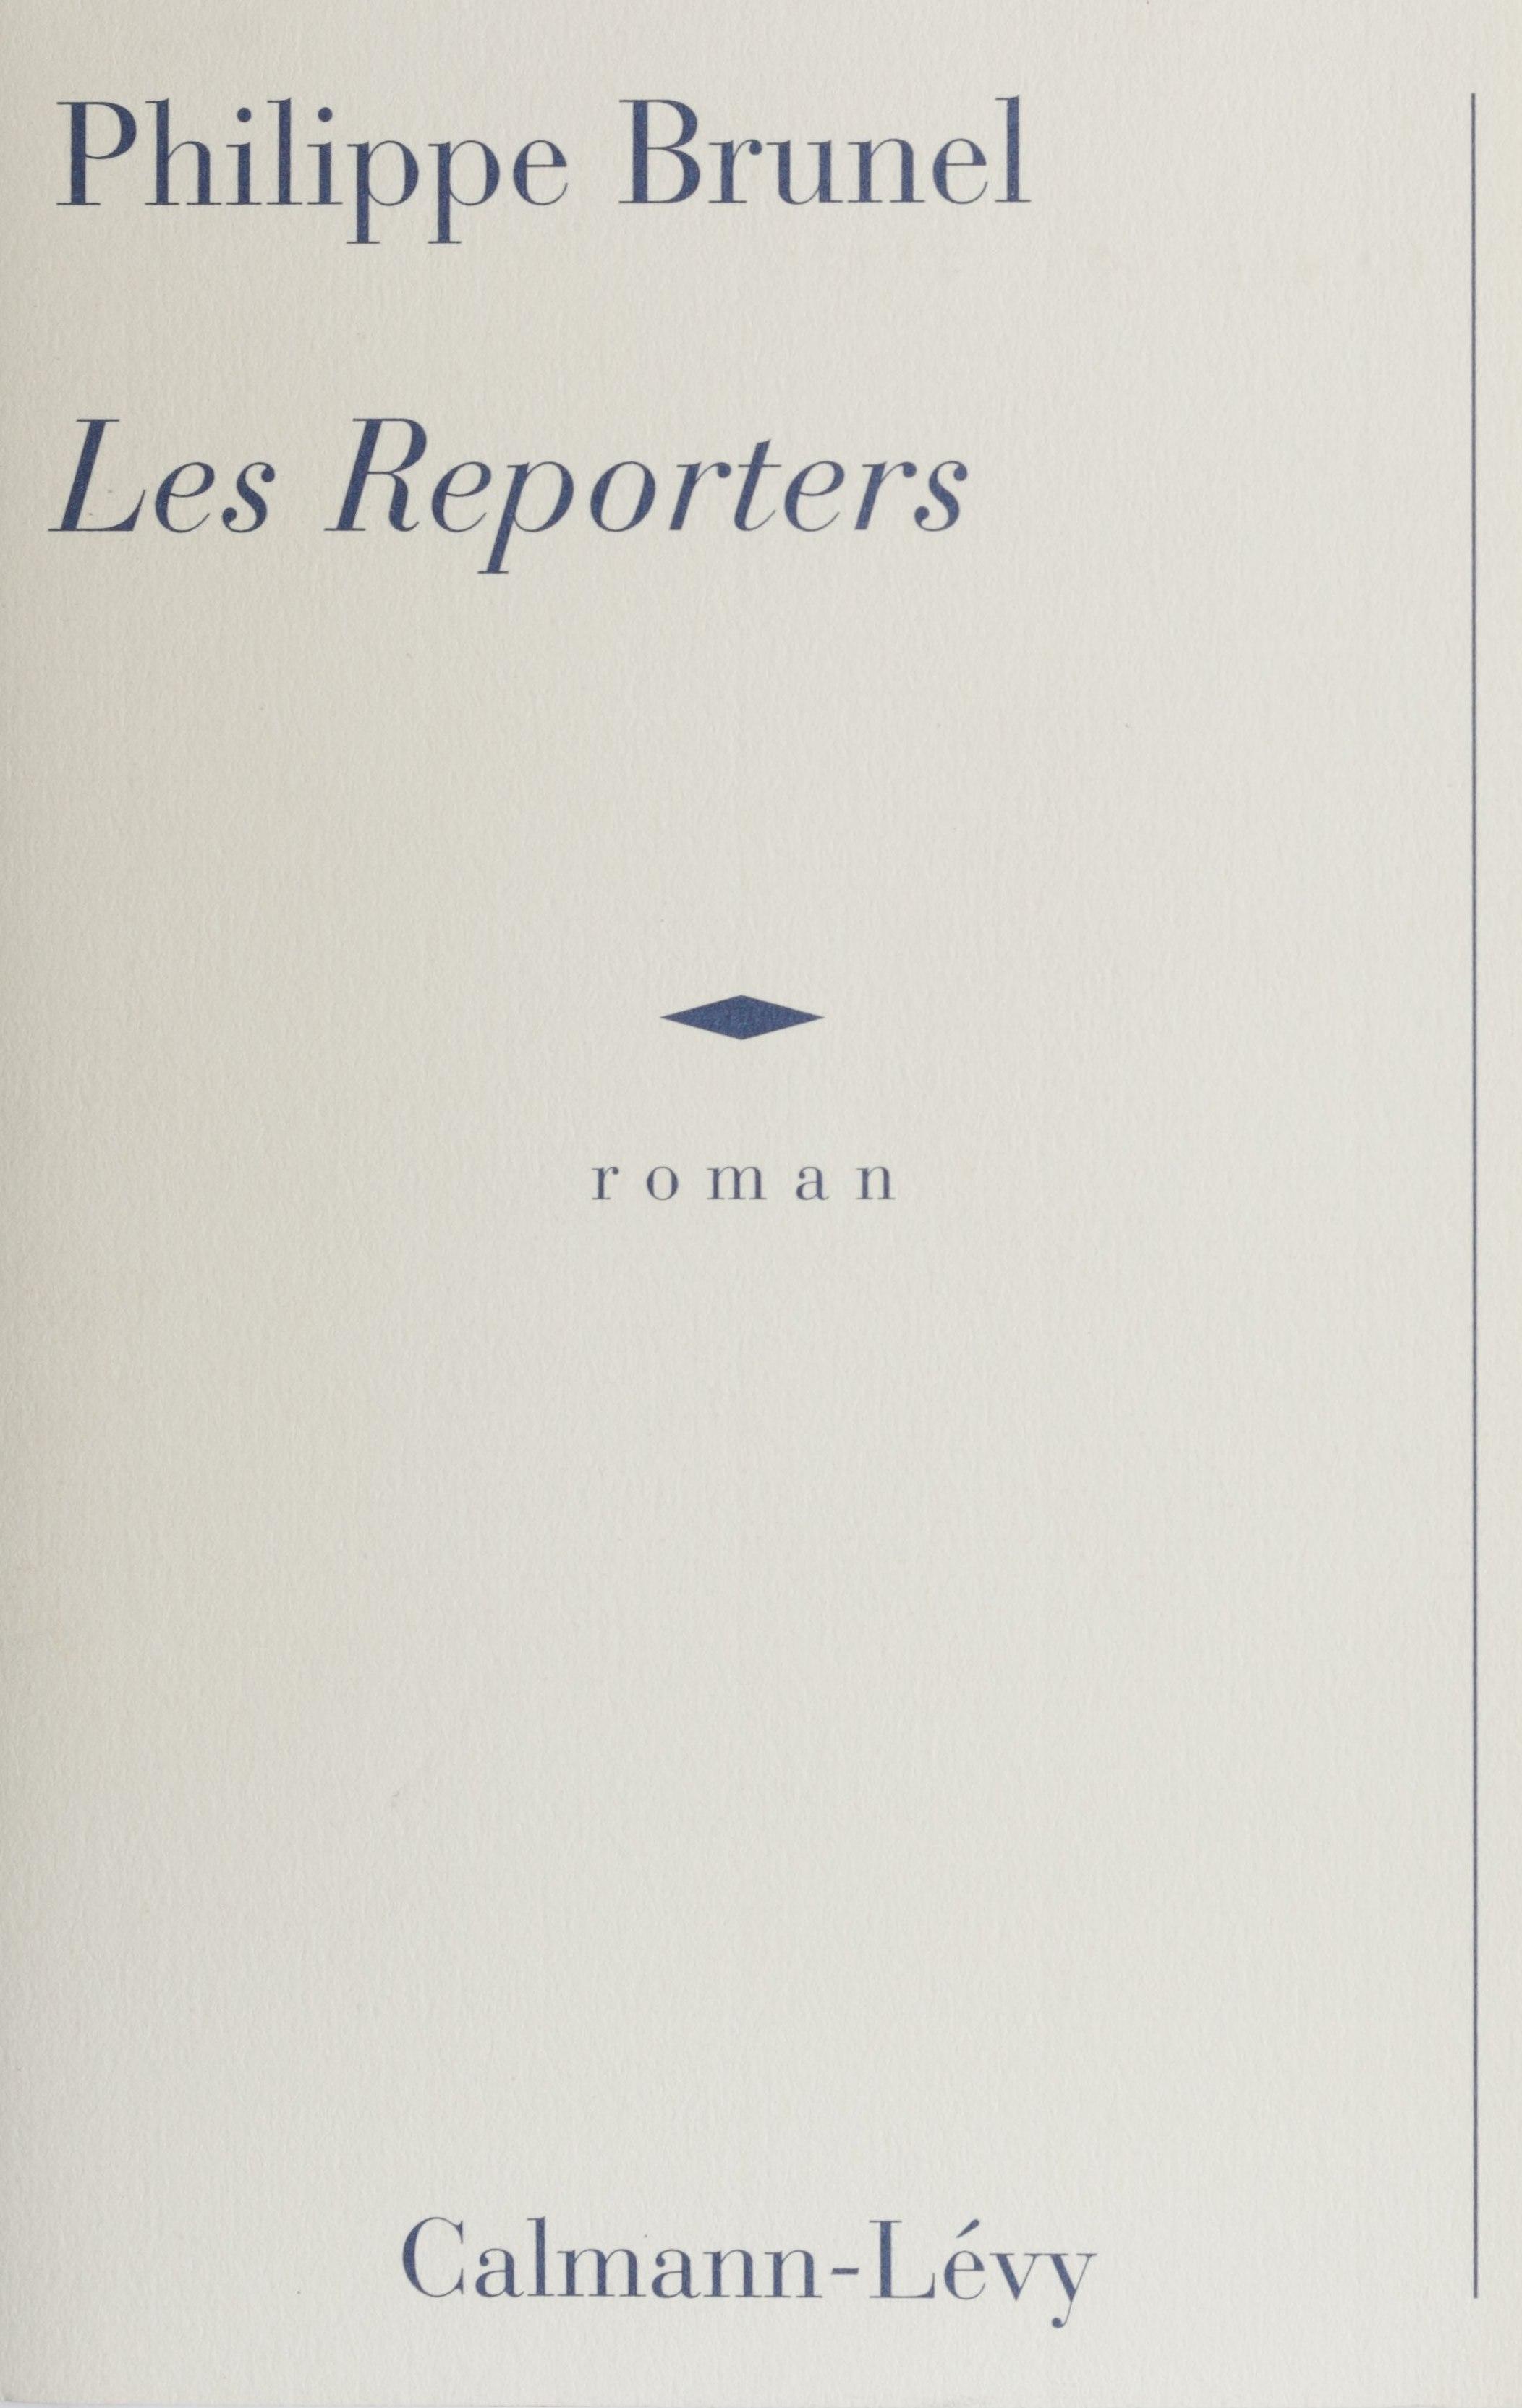 Les Reporters